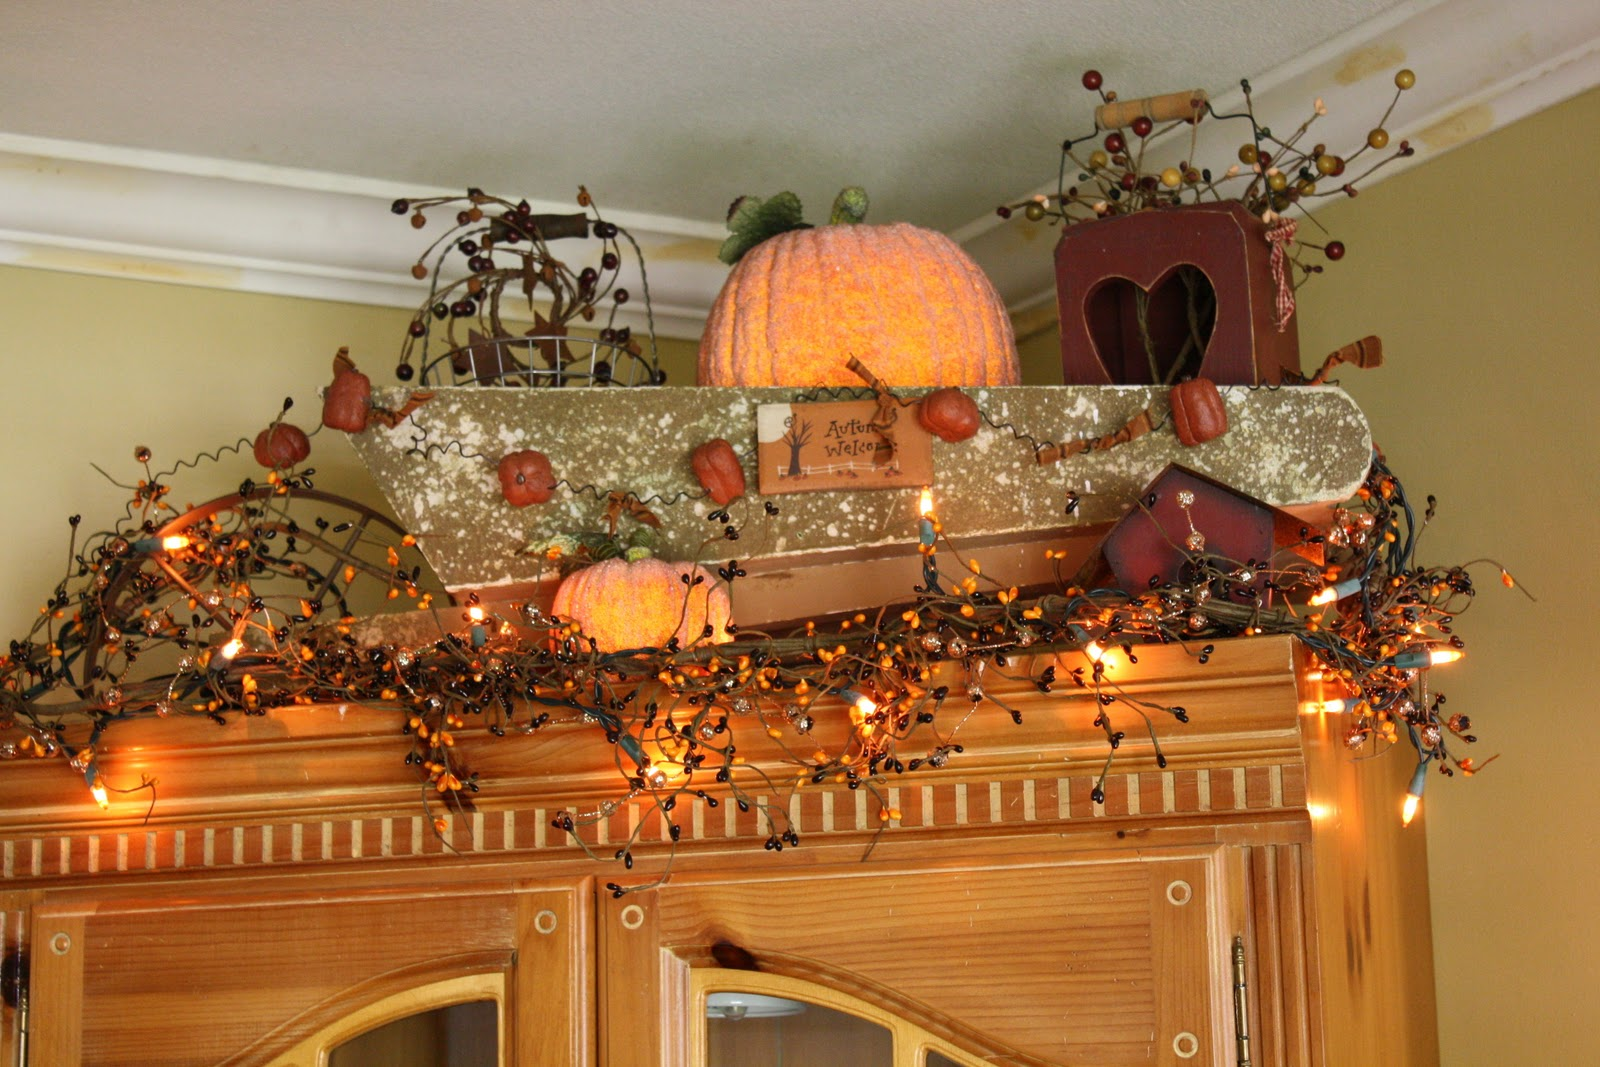 farmhouse fall decor prim fall decor - Fall Decor